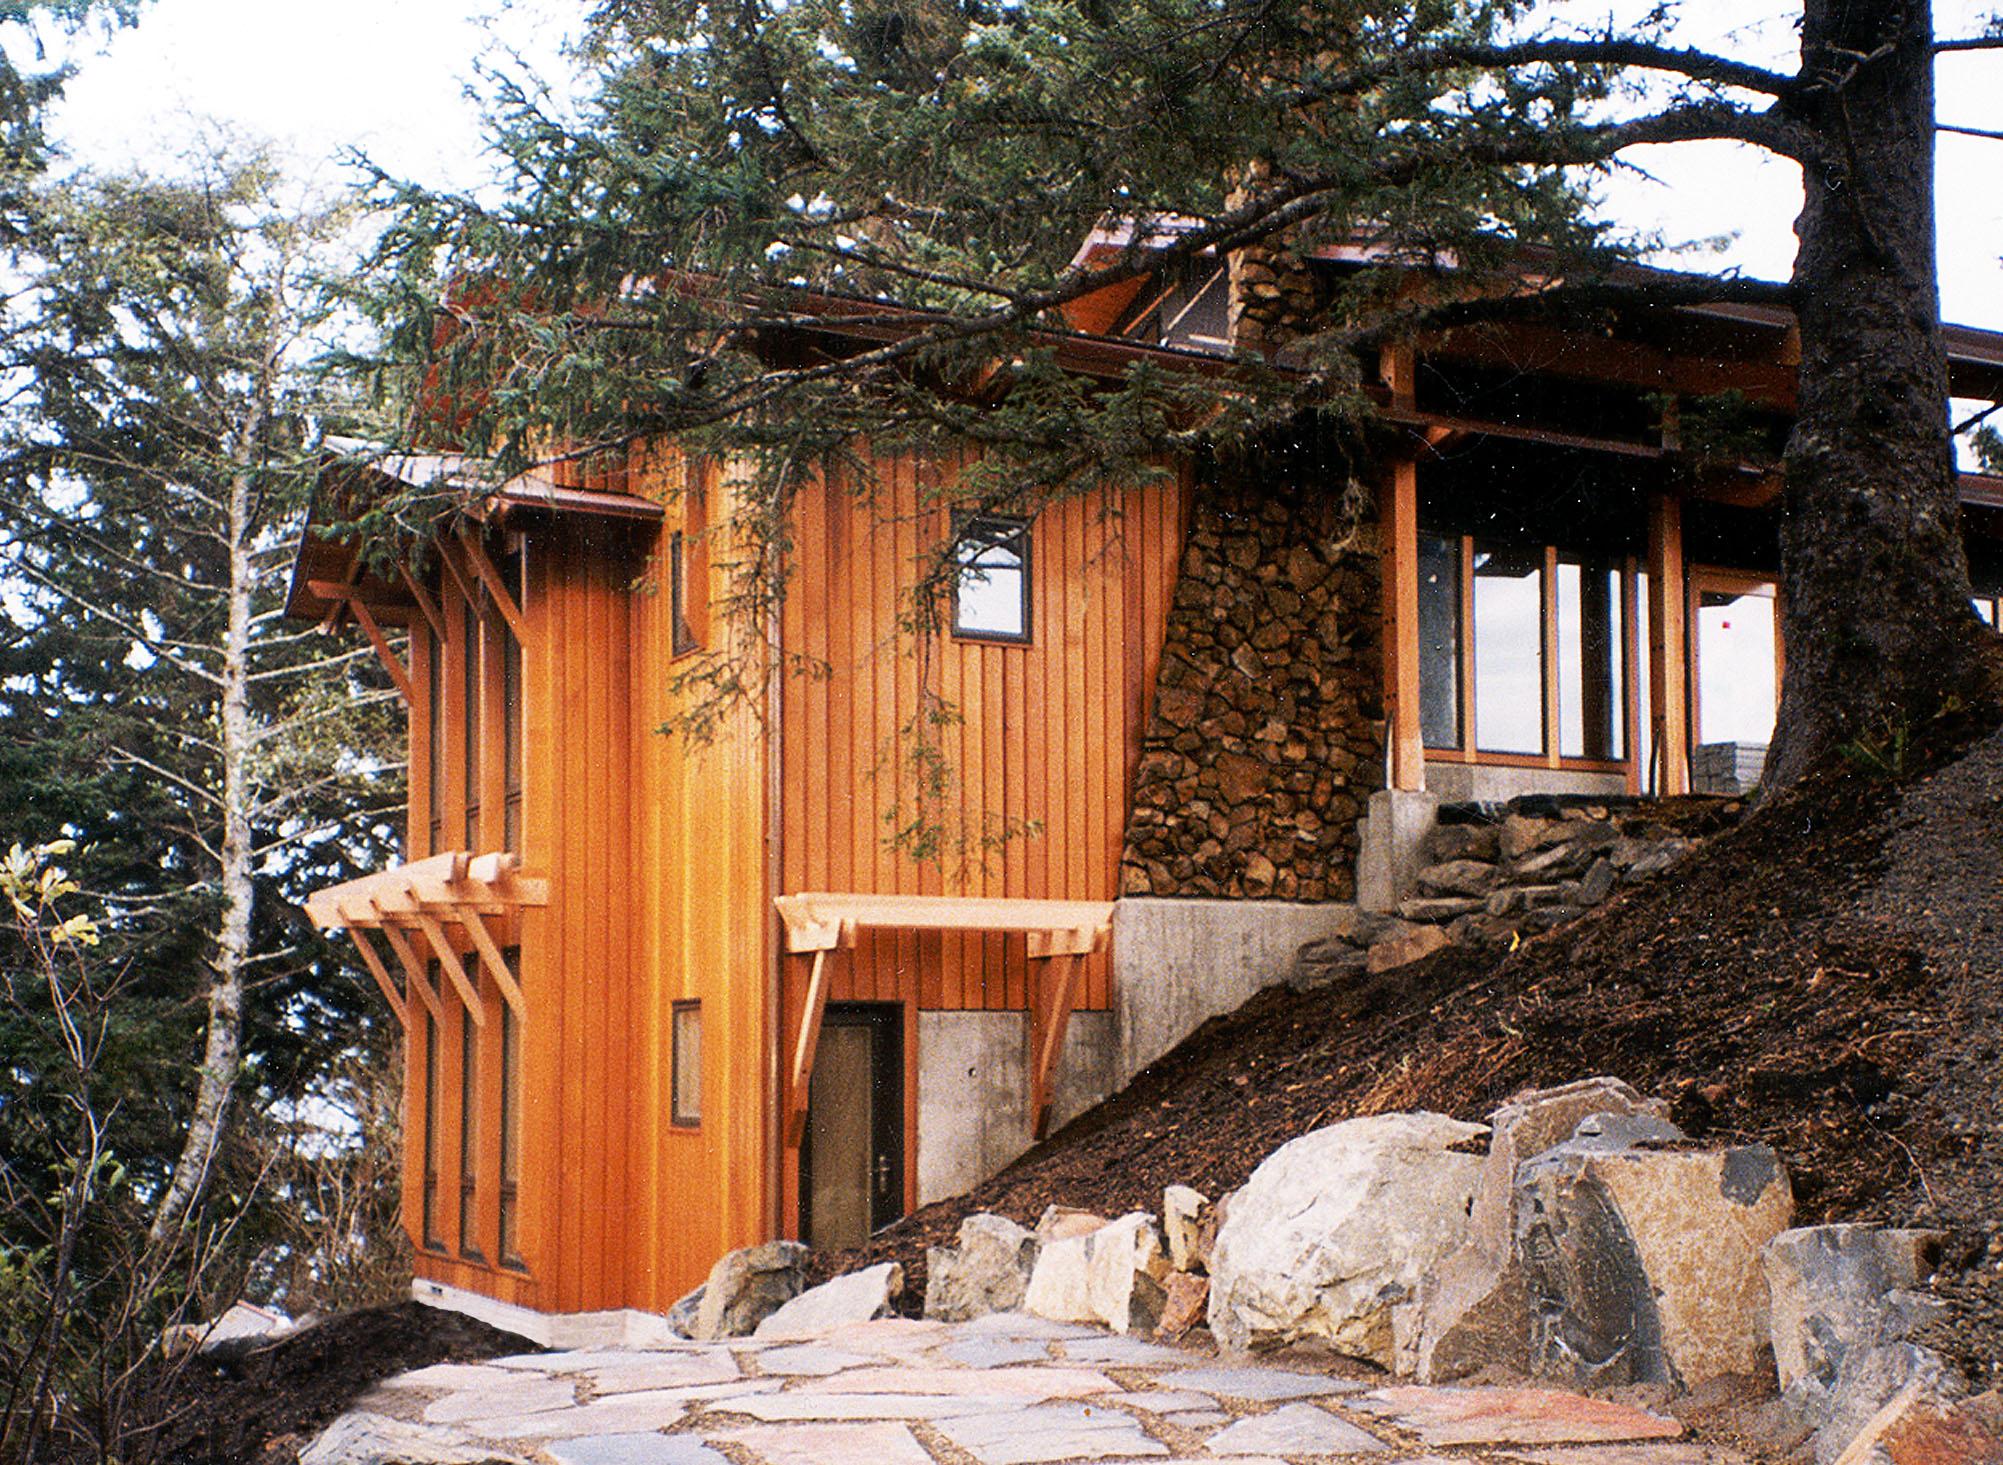 Hockensmith Residence